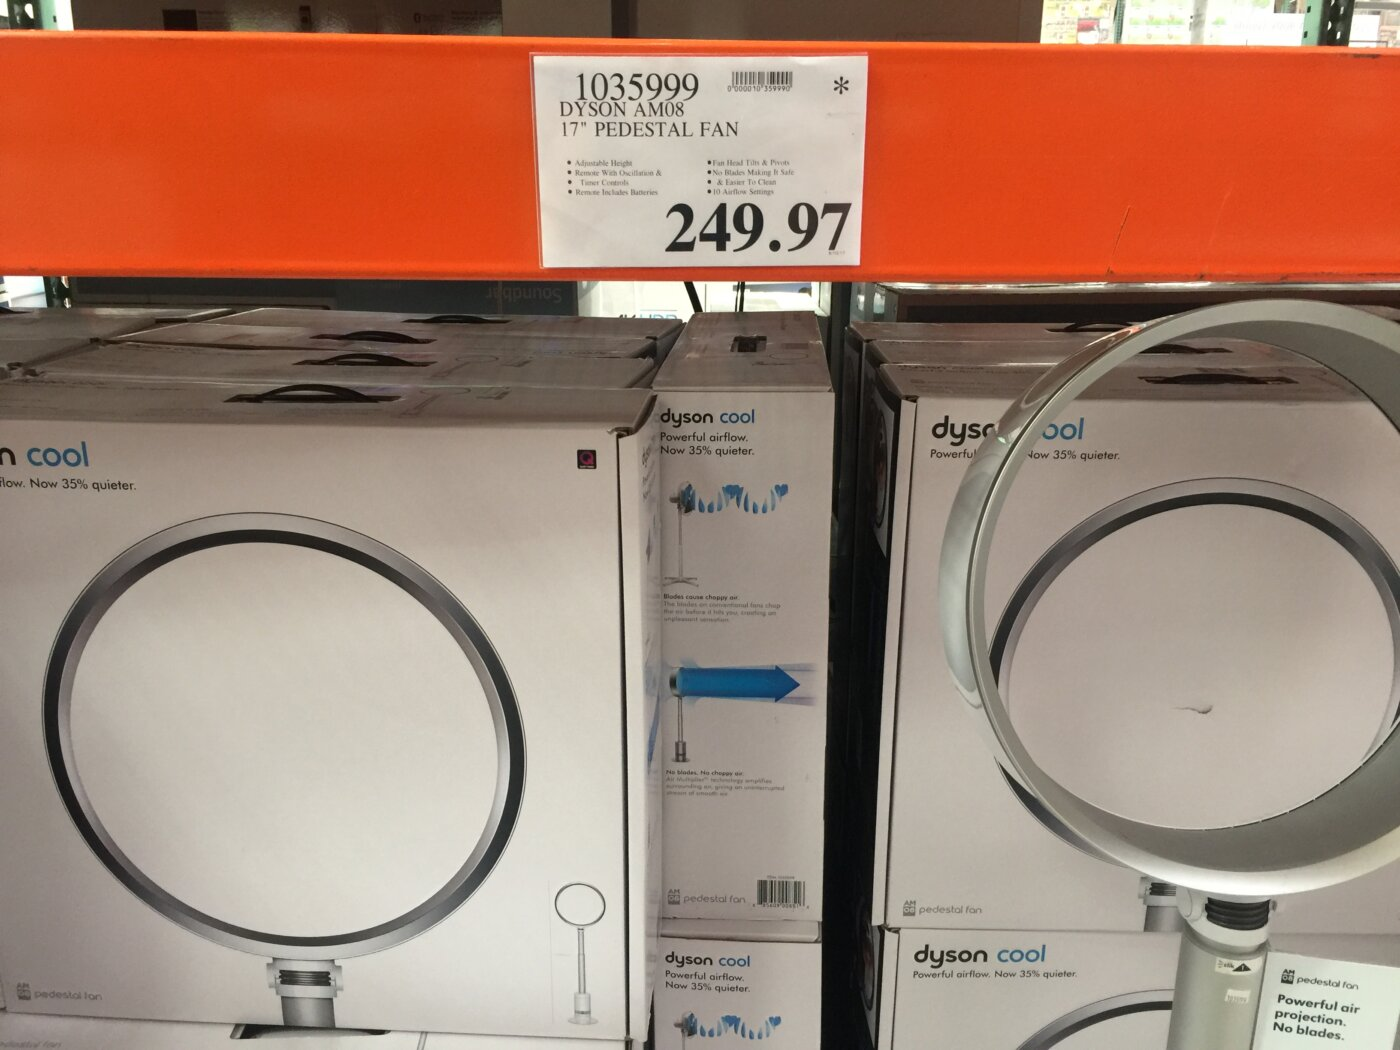 fans farrta large pedestal icon pedestalfan sitemap white fan dyson xml appliances